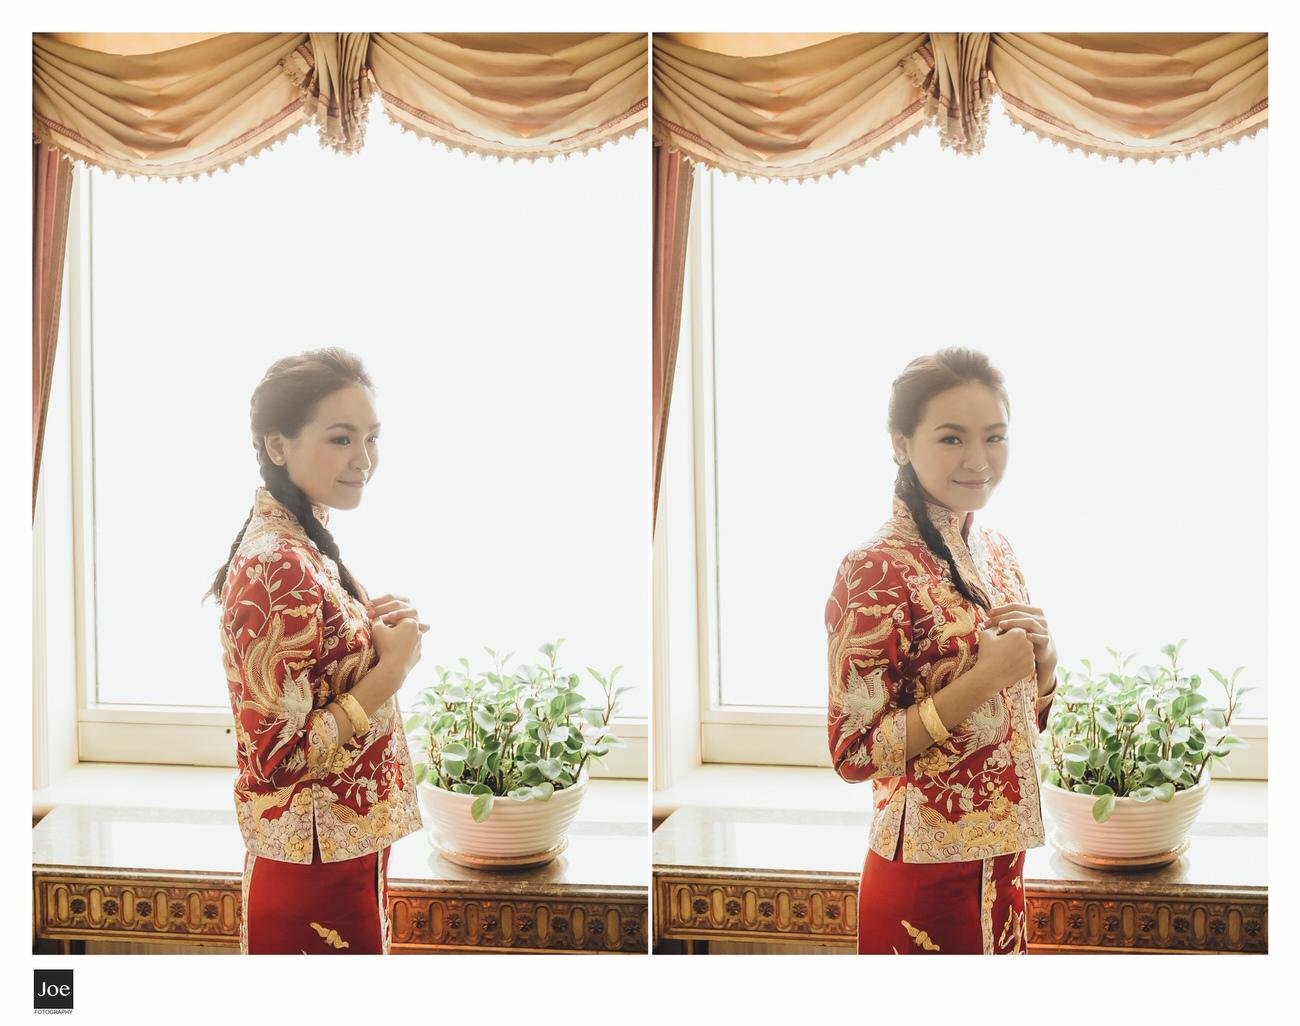 grand-hilai-hotel-wedding-daniel-yvette-joe-fotography-007.jpg